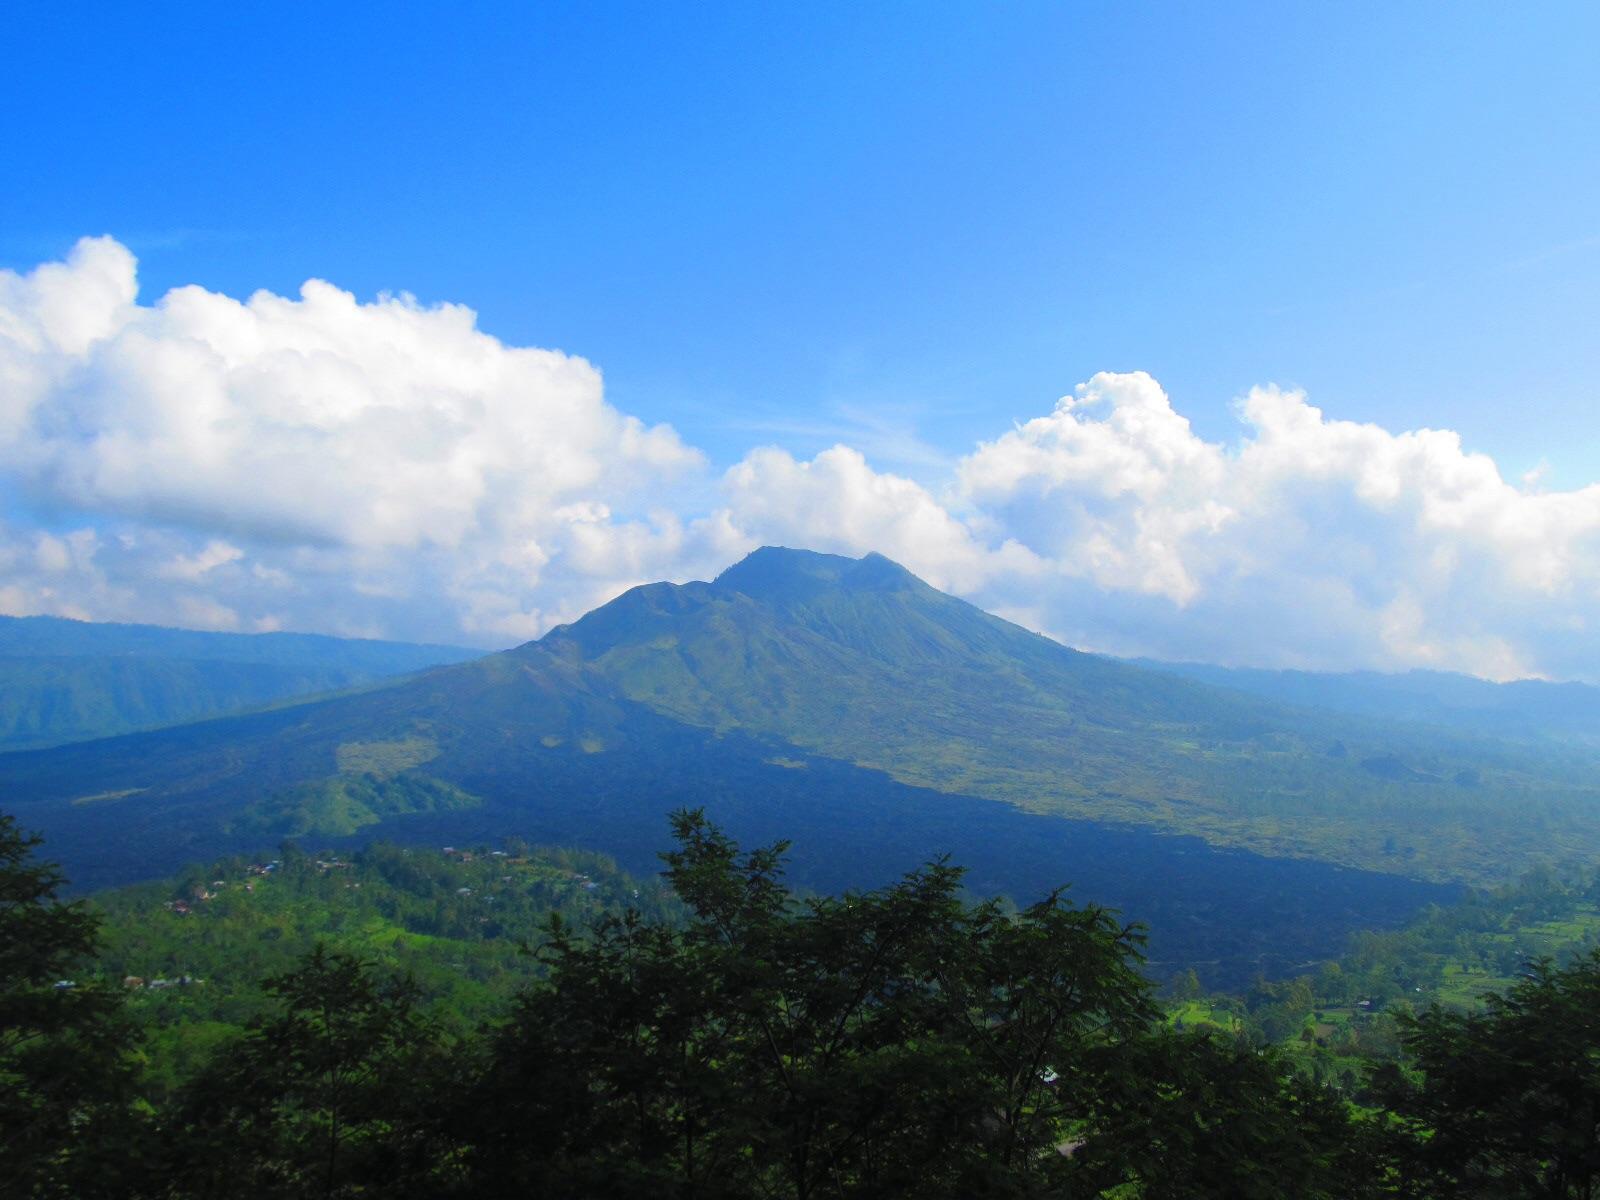 Mountain Batur